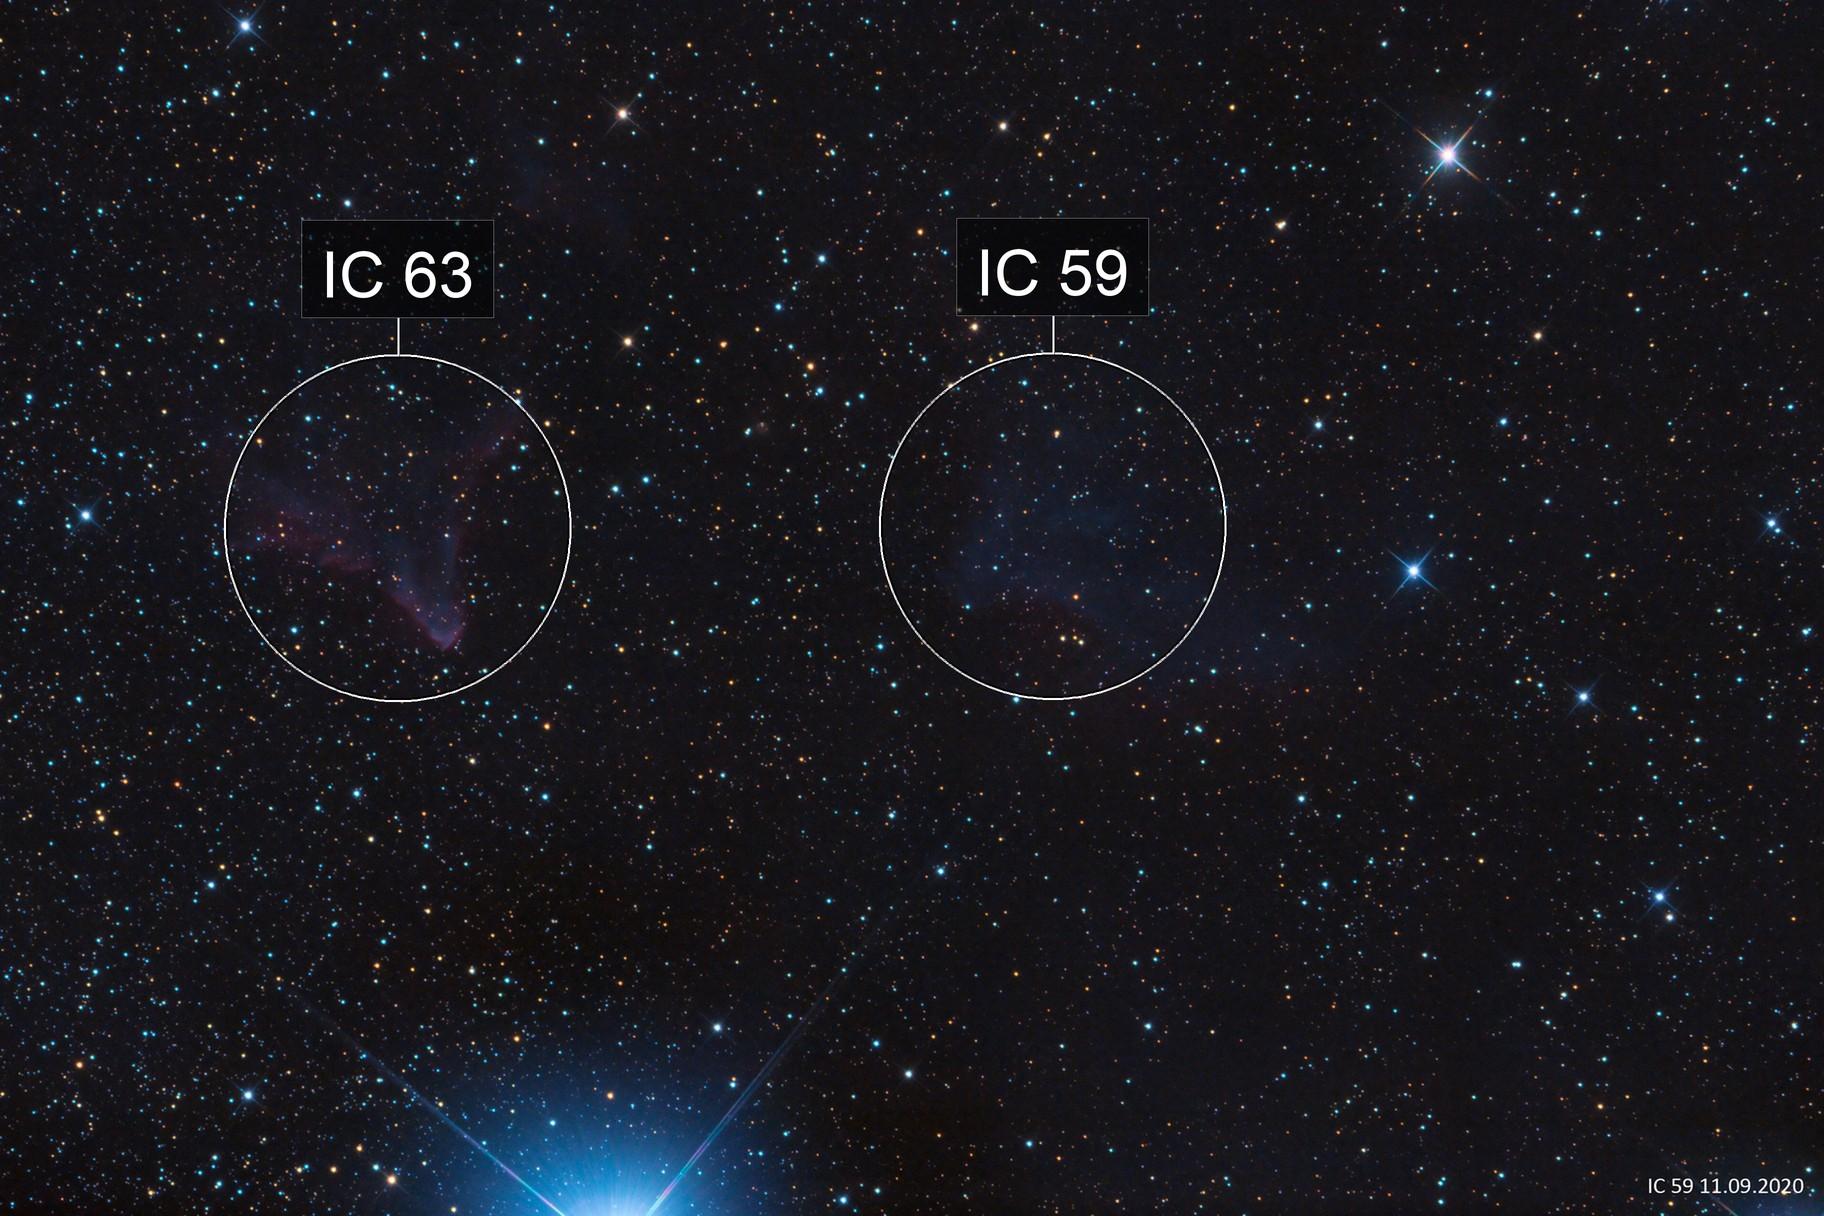 IC 59